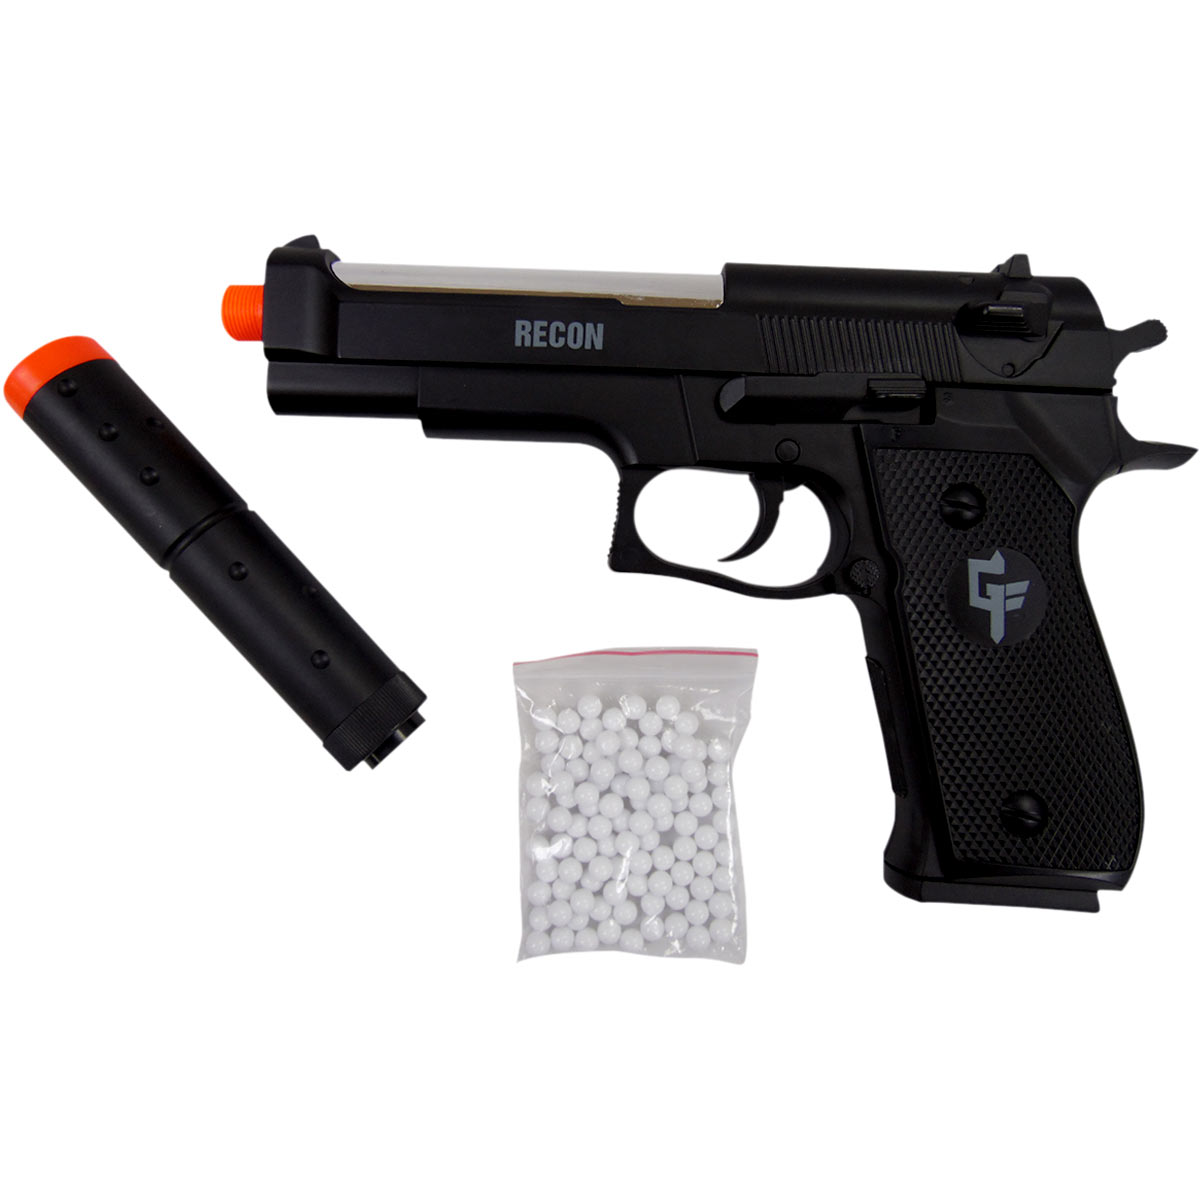 Pistola Balines Airsoft Bbs Kit Funda Municiones Mendoza